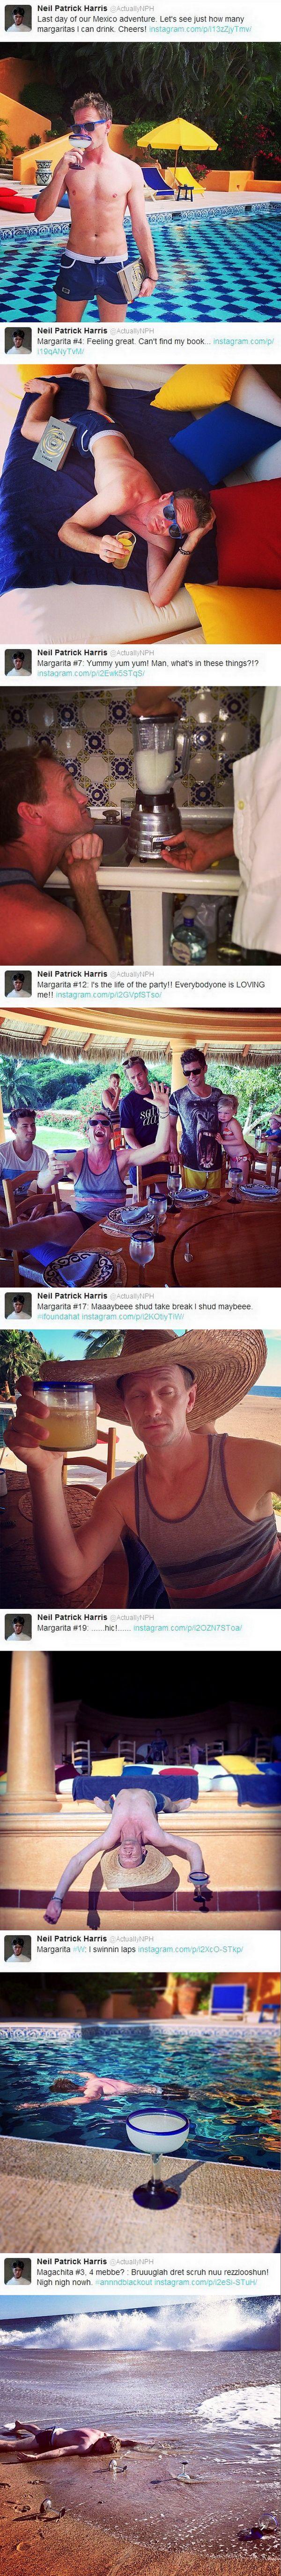 Neil Patrick Harris is such a legend...